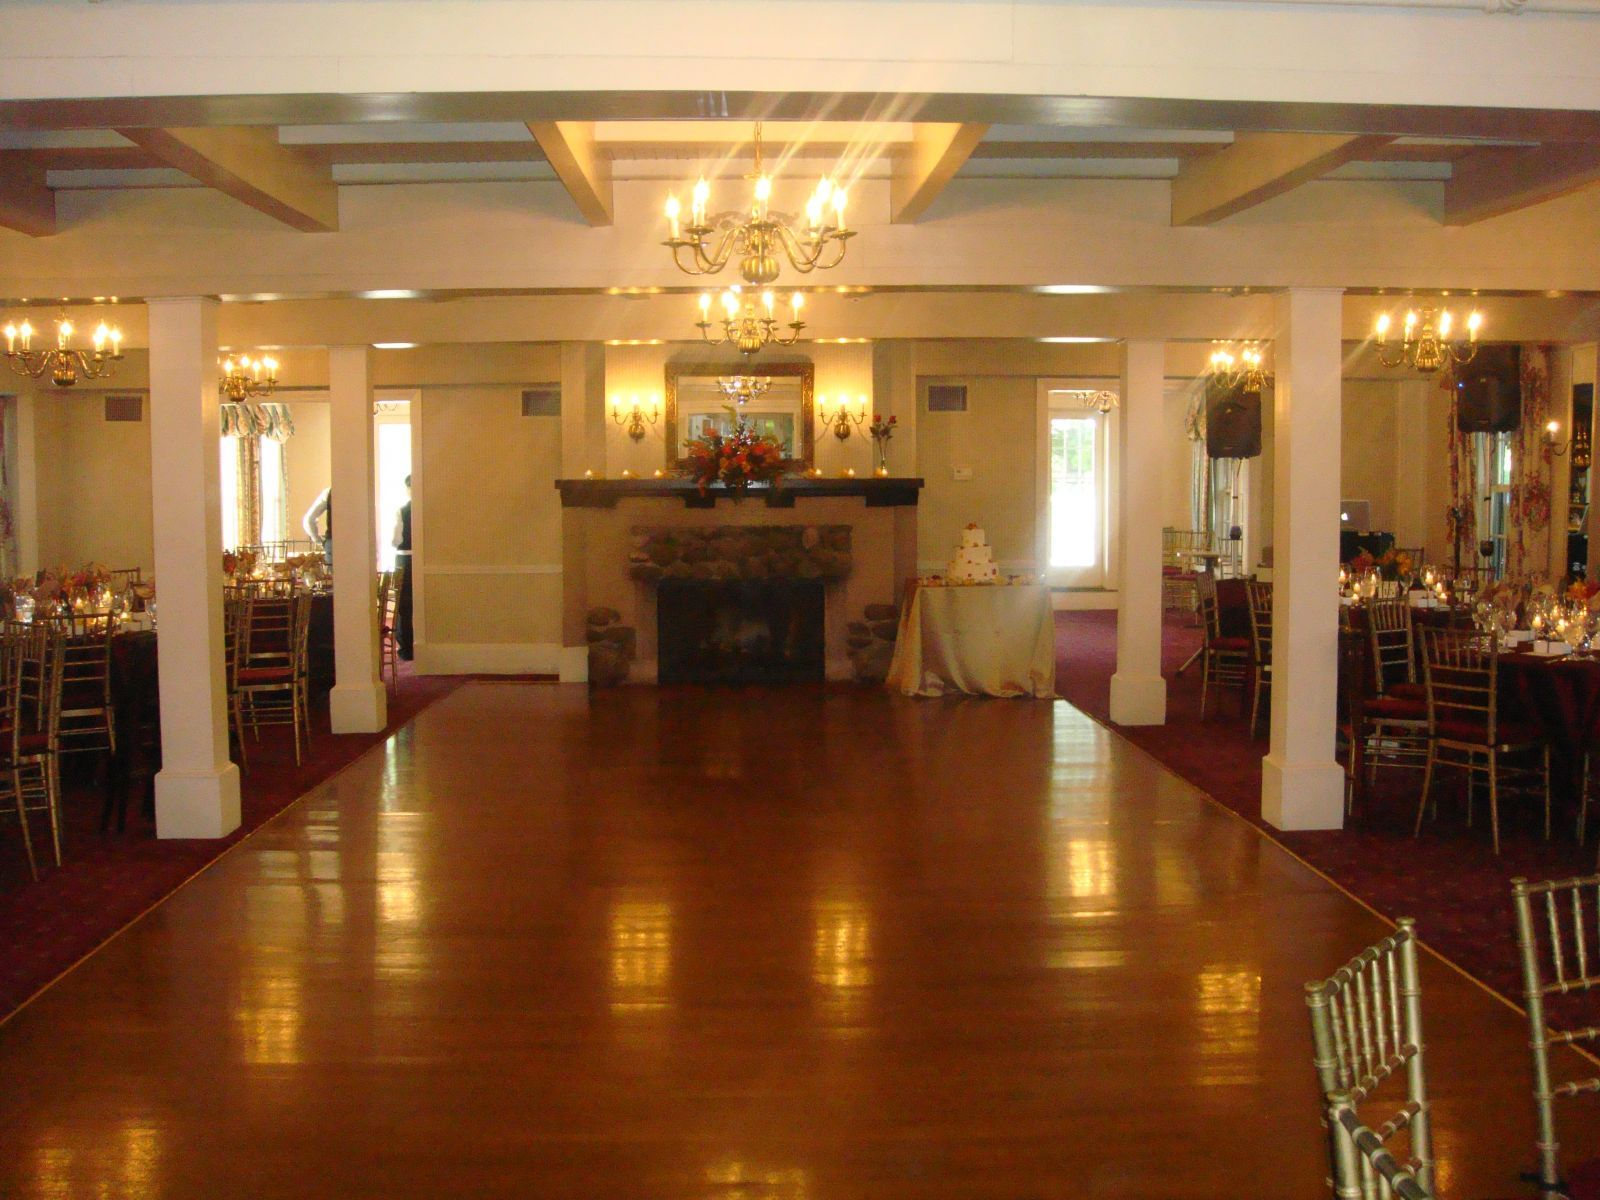 Sandy Burr Country Club S Ballroom In Wayland Massachuetts